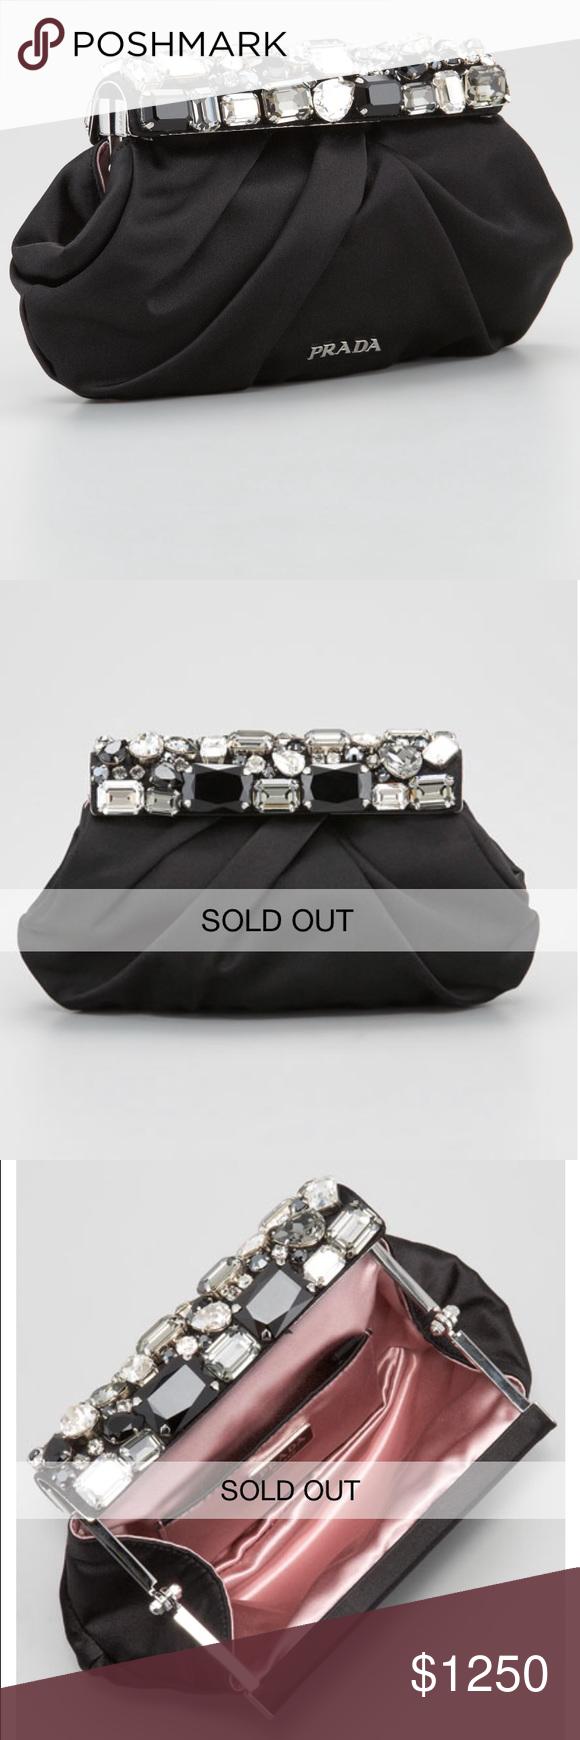 ... netherlands prada jeweled satin clutch bag new without tags. prada  jeweled satin clutch bag. 220a78f66c635